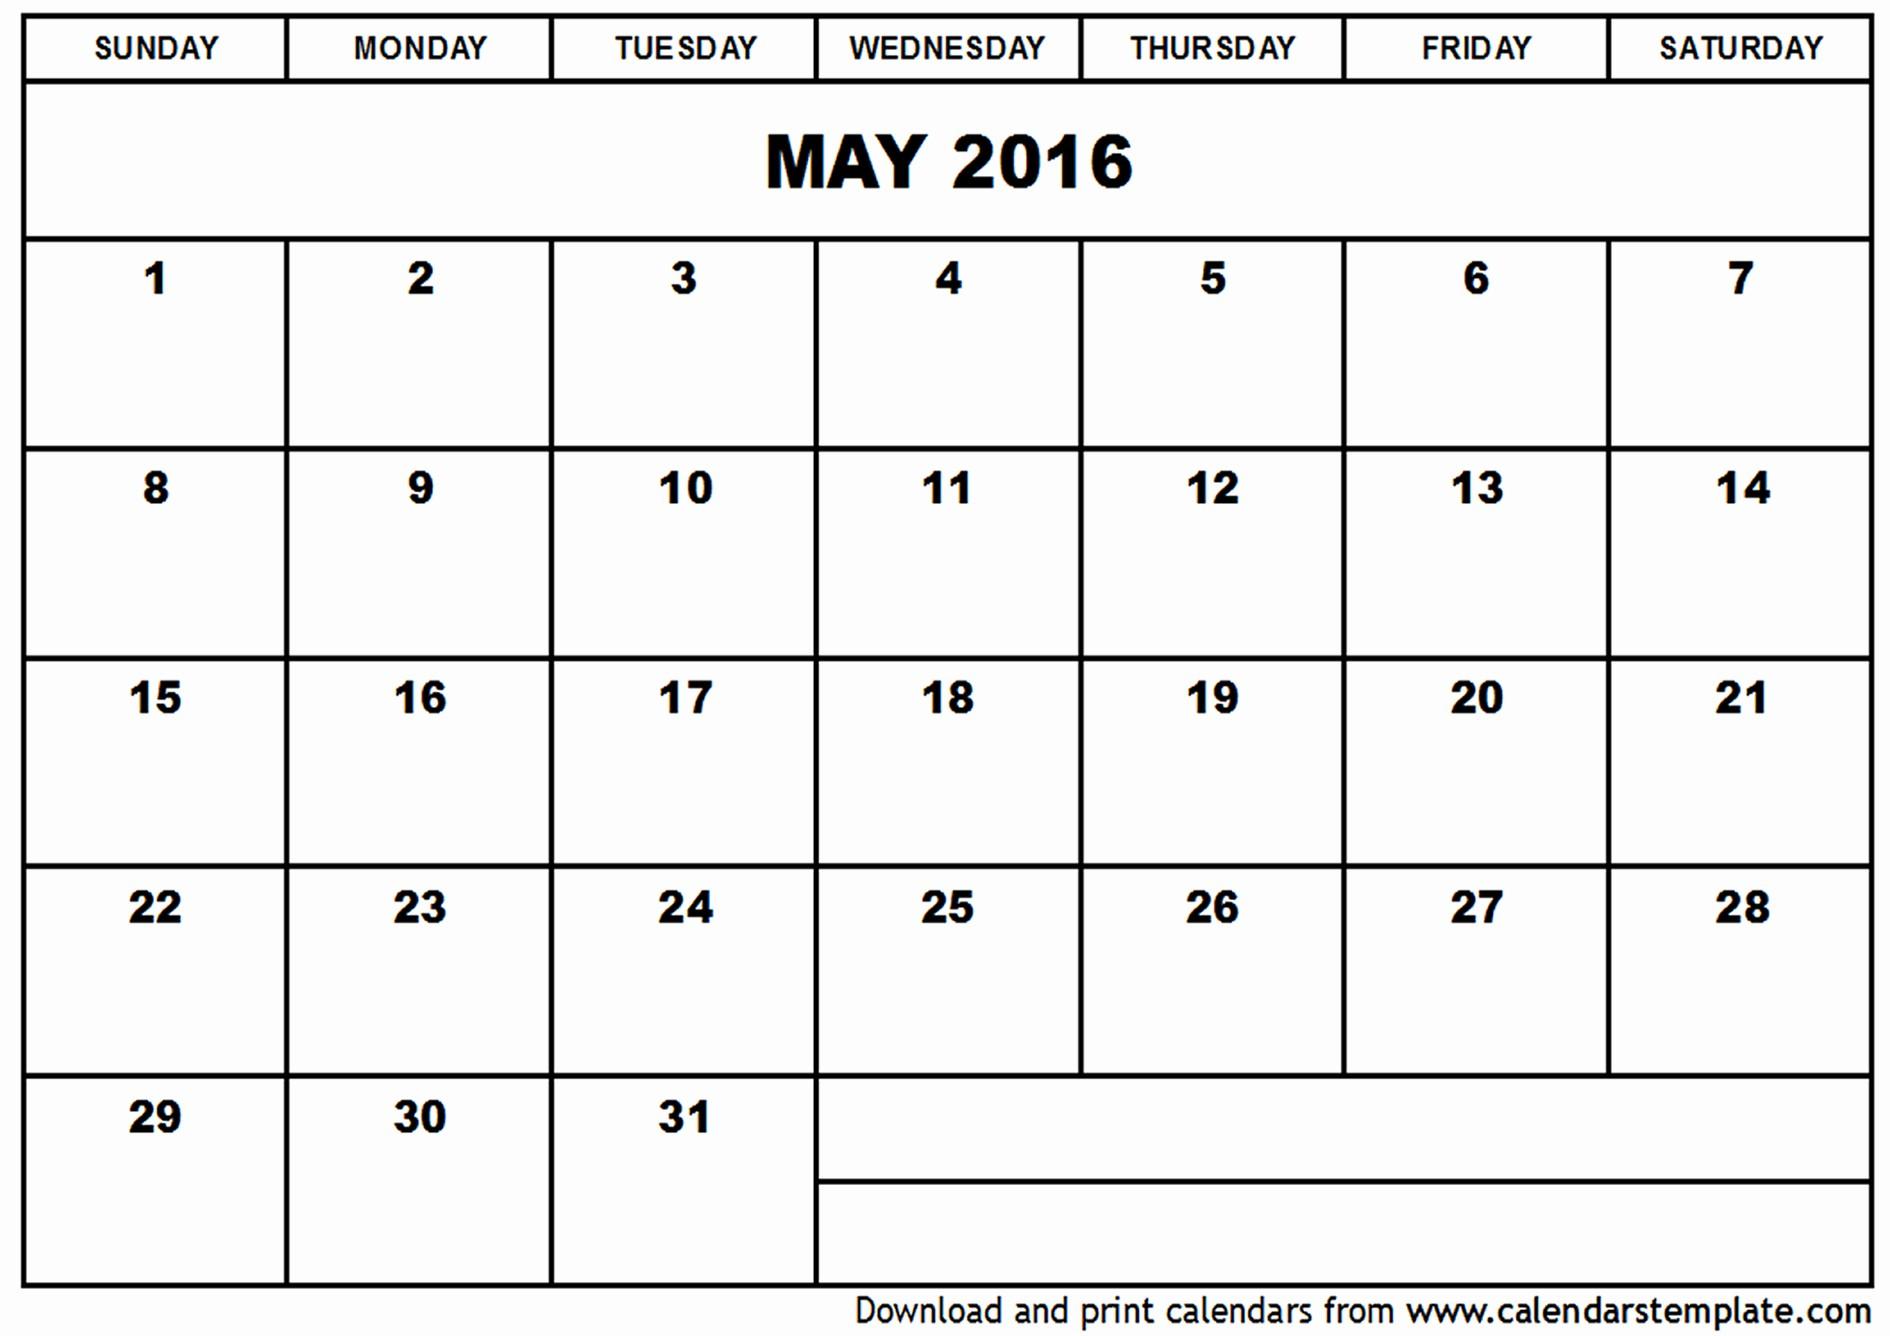 Free Downloadable 2016 Calendar Template Best Of May 2016 Calendar Template